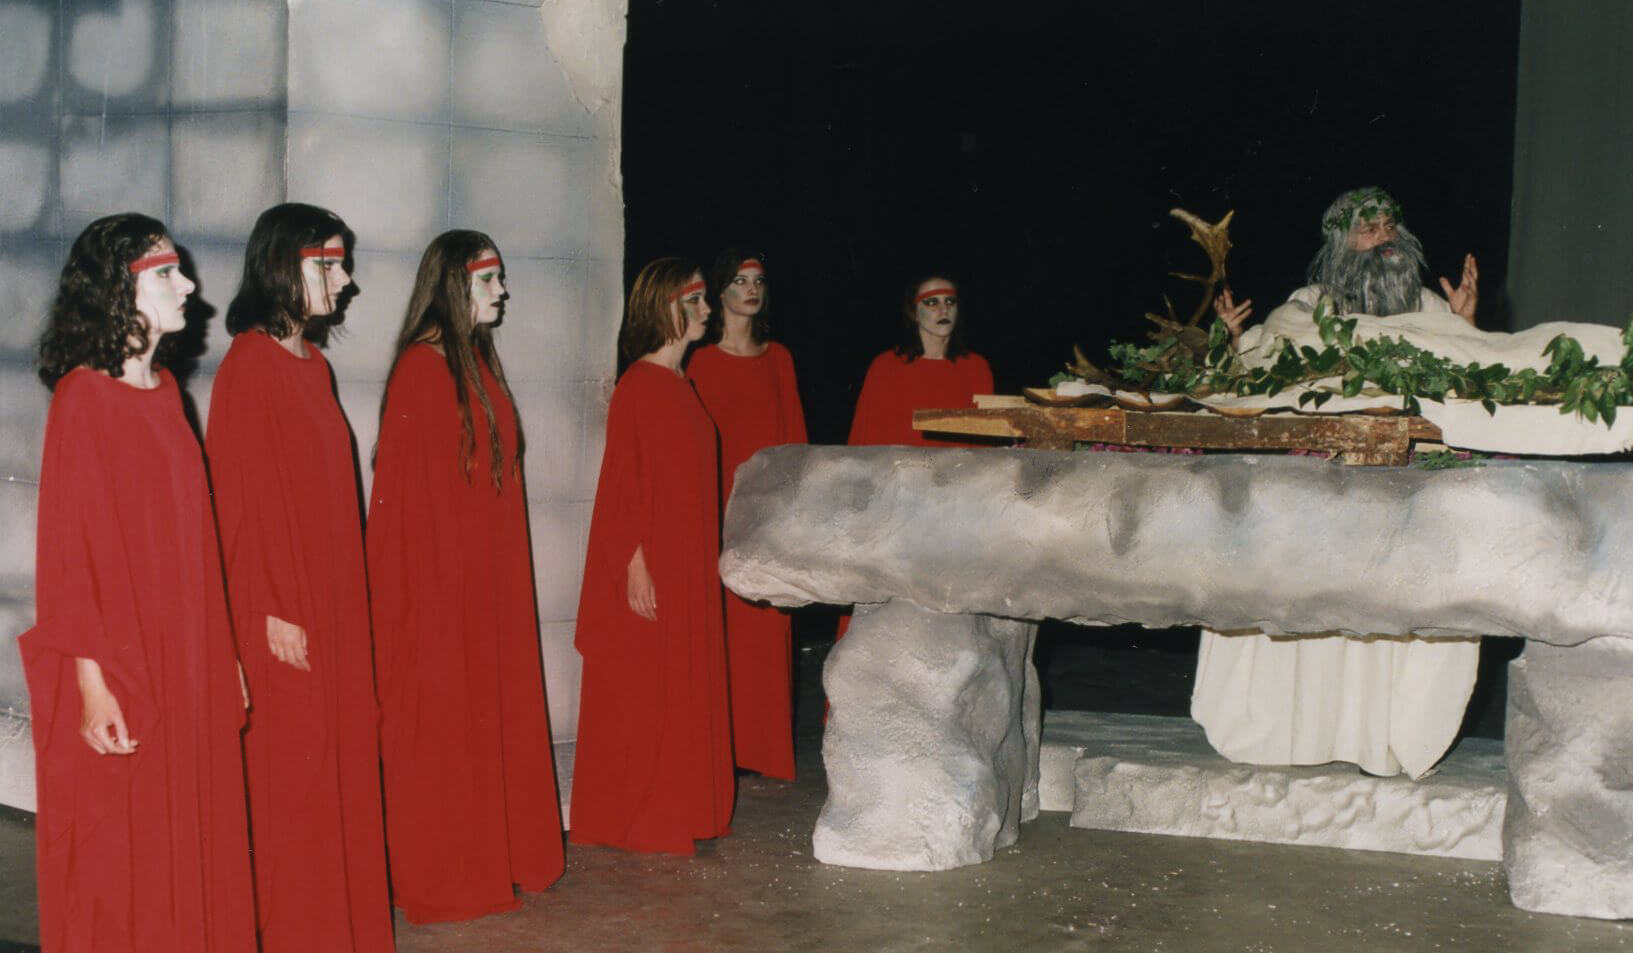 het Sint-Dimpnaspel